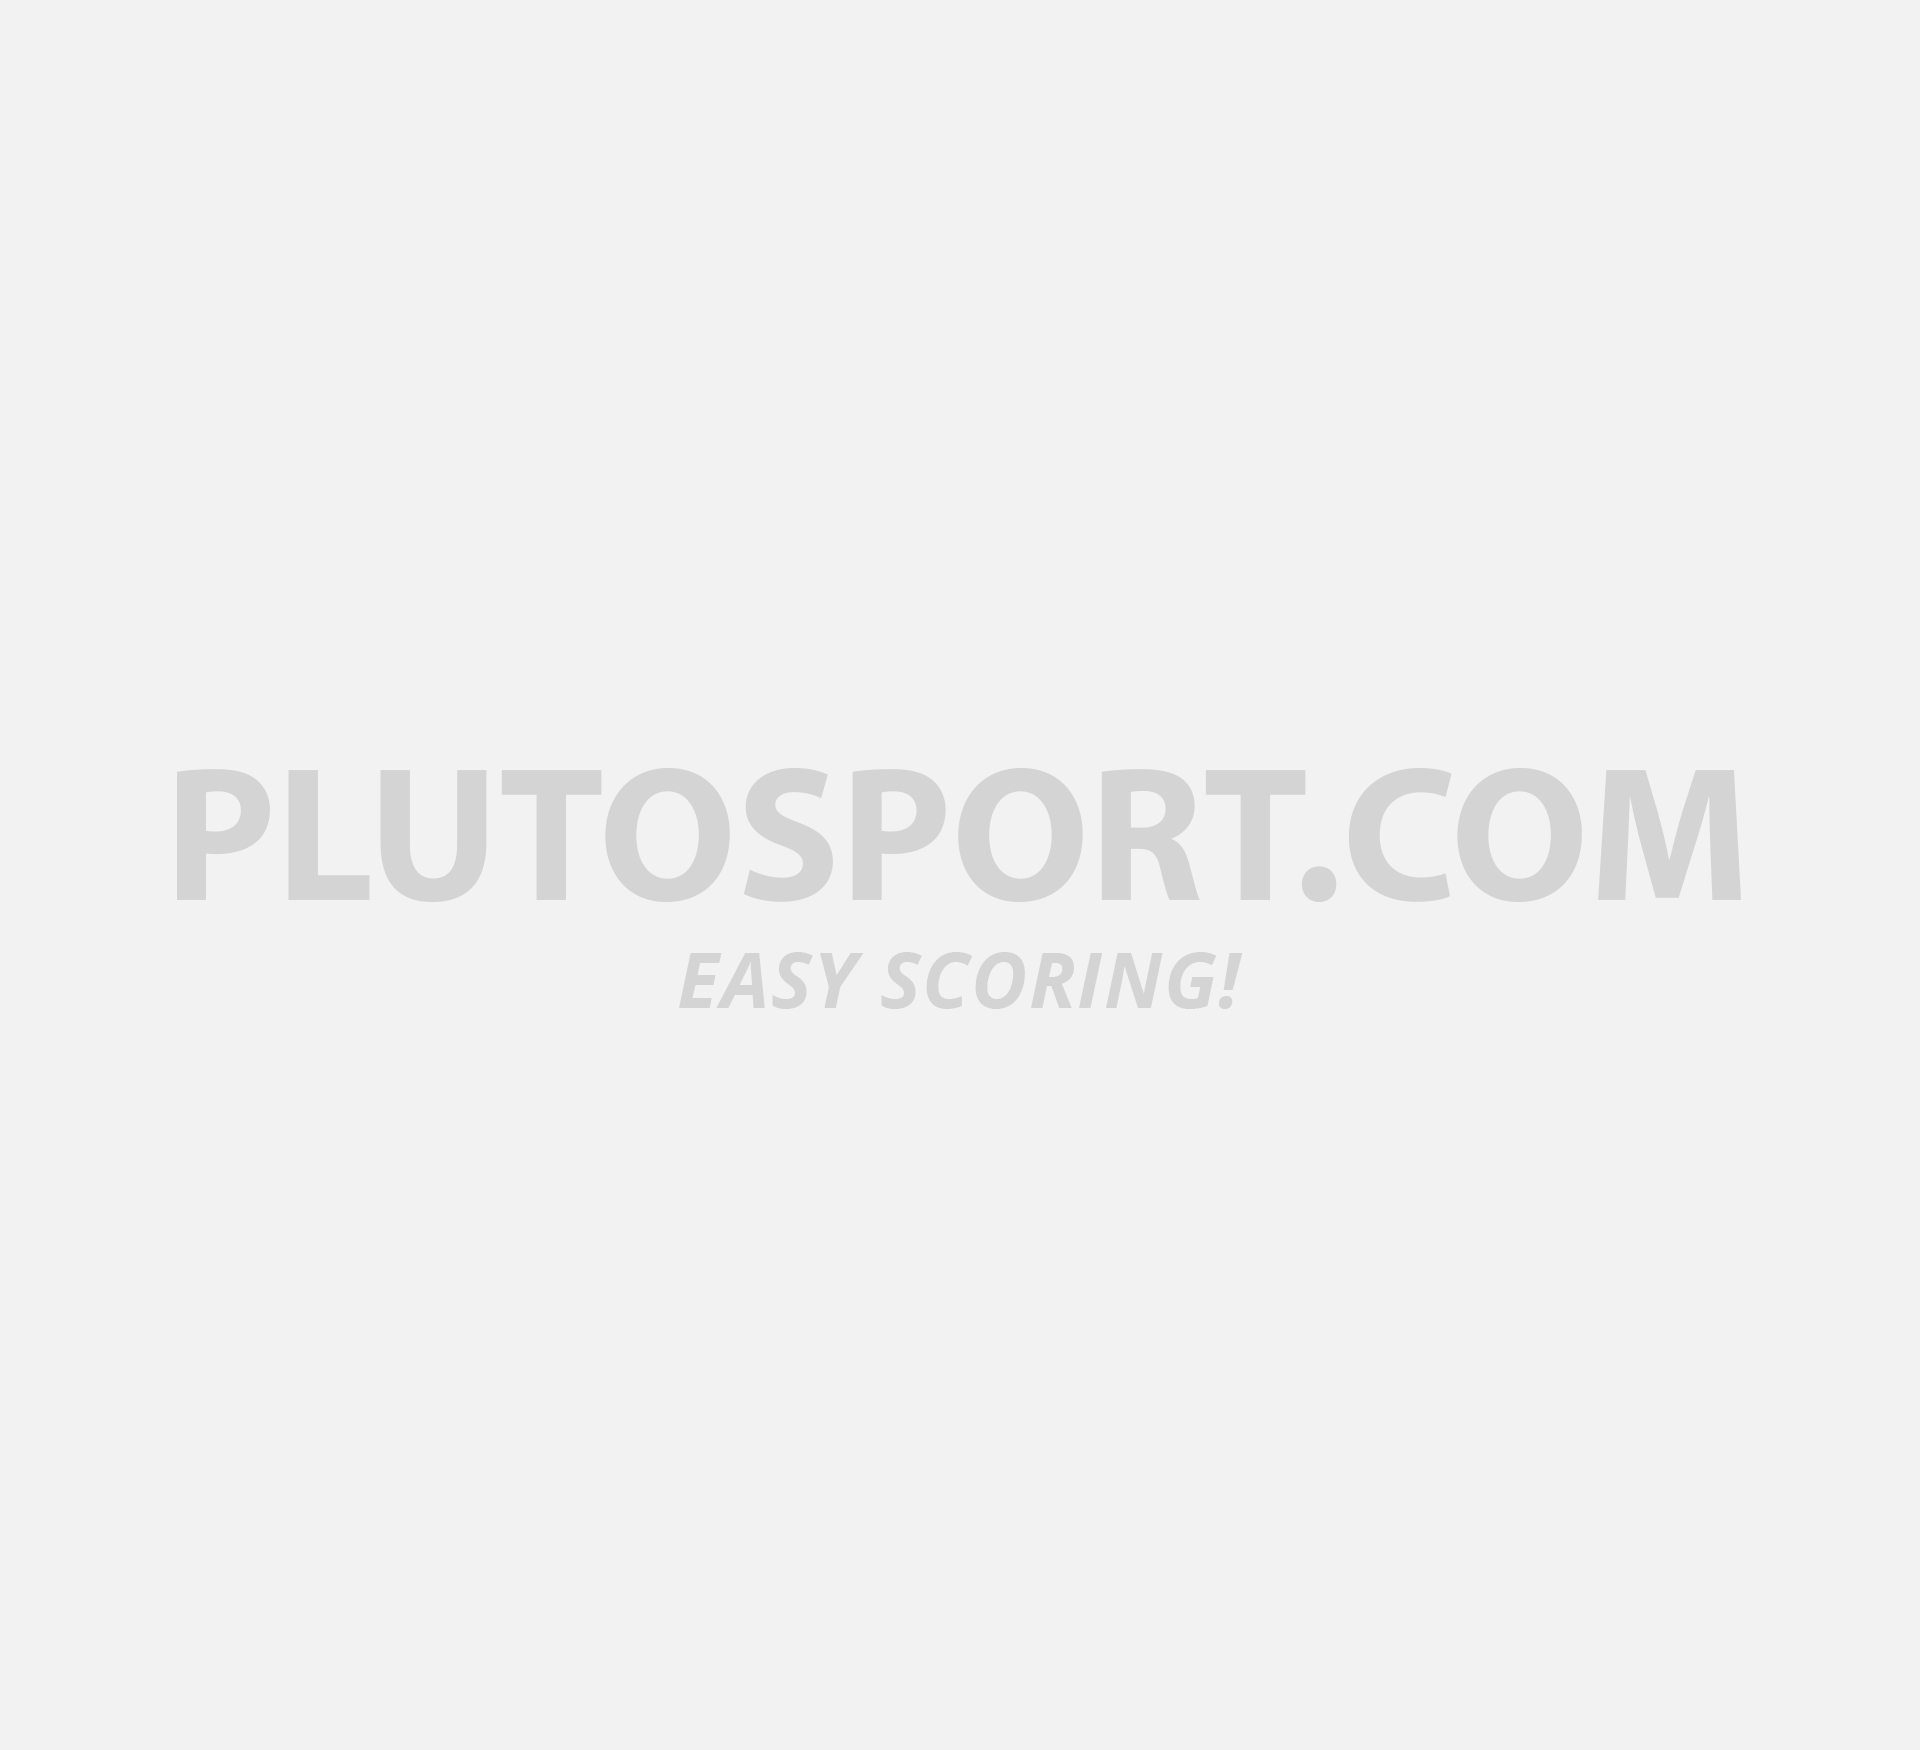 Adidas Workout Motion II Fitnessshoe Womenu0026#39;s - Shoes - Fitness - Sports | Plutosport